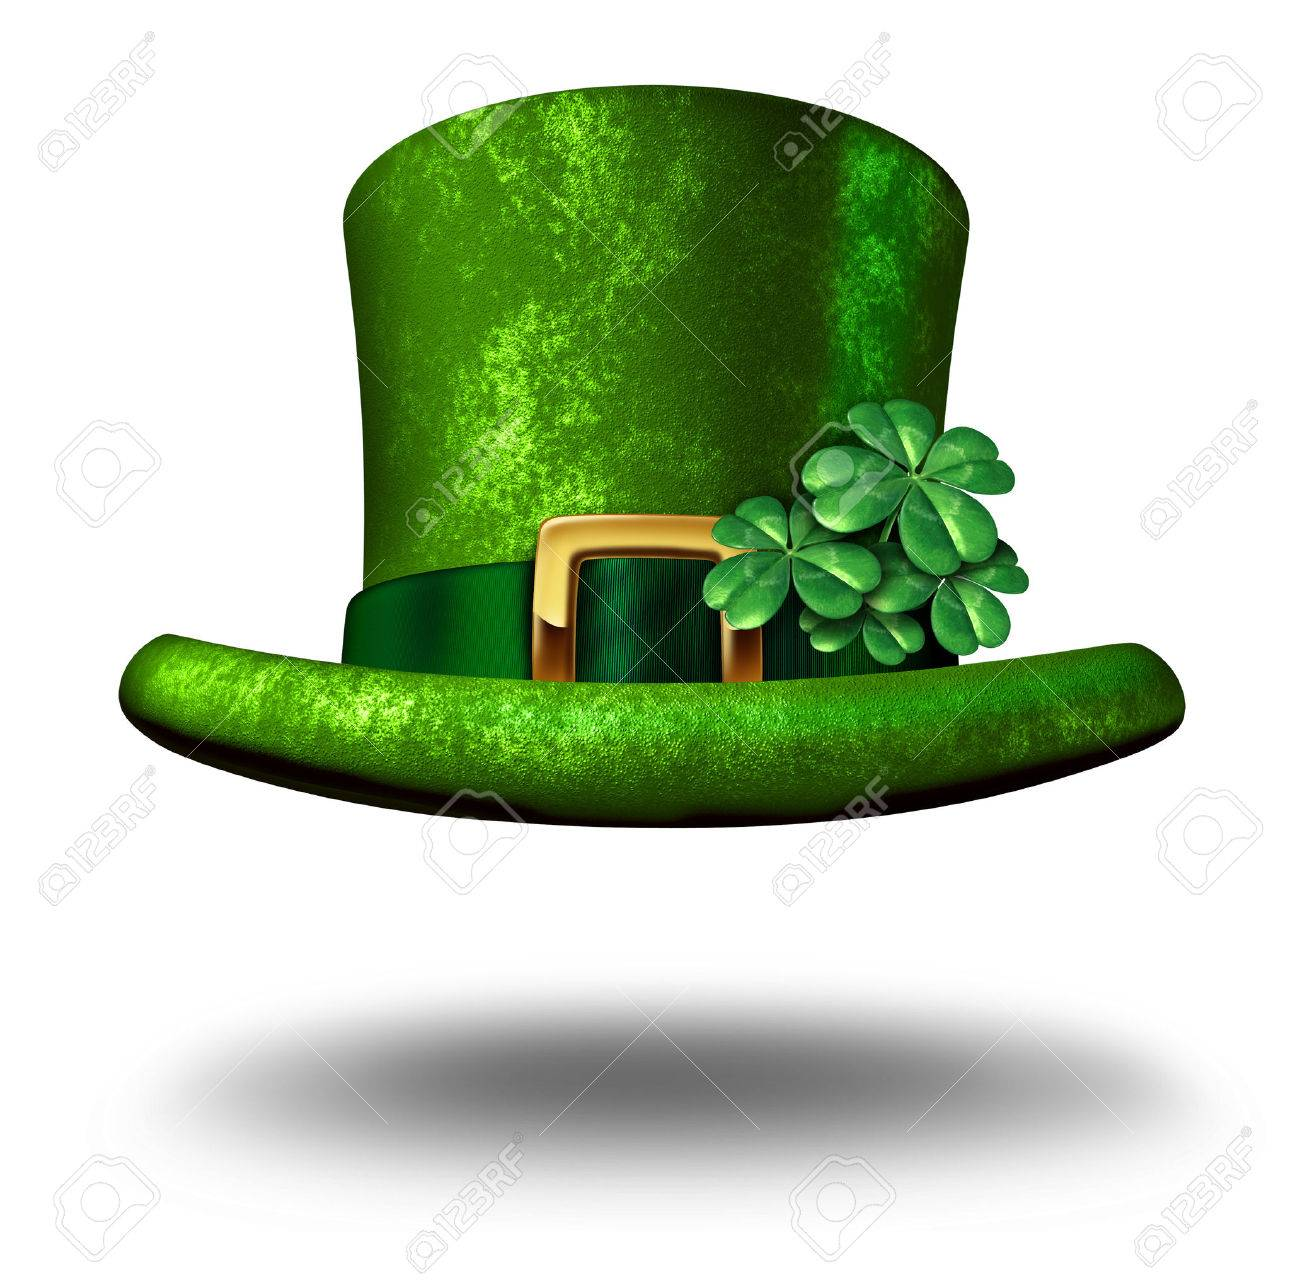 Green shamrock lucky top hat as a st patricks day symbol and stock green shamrock lucky top hat as a st patricks day symbol and luck icon of irish biocorpaavc Gallery